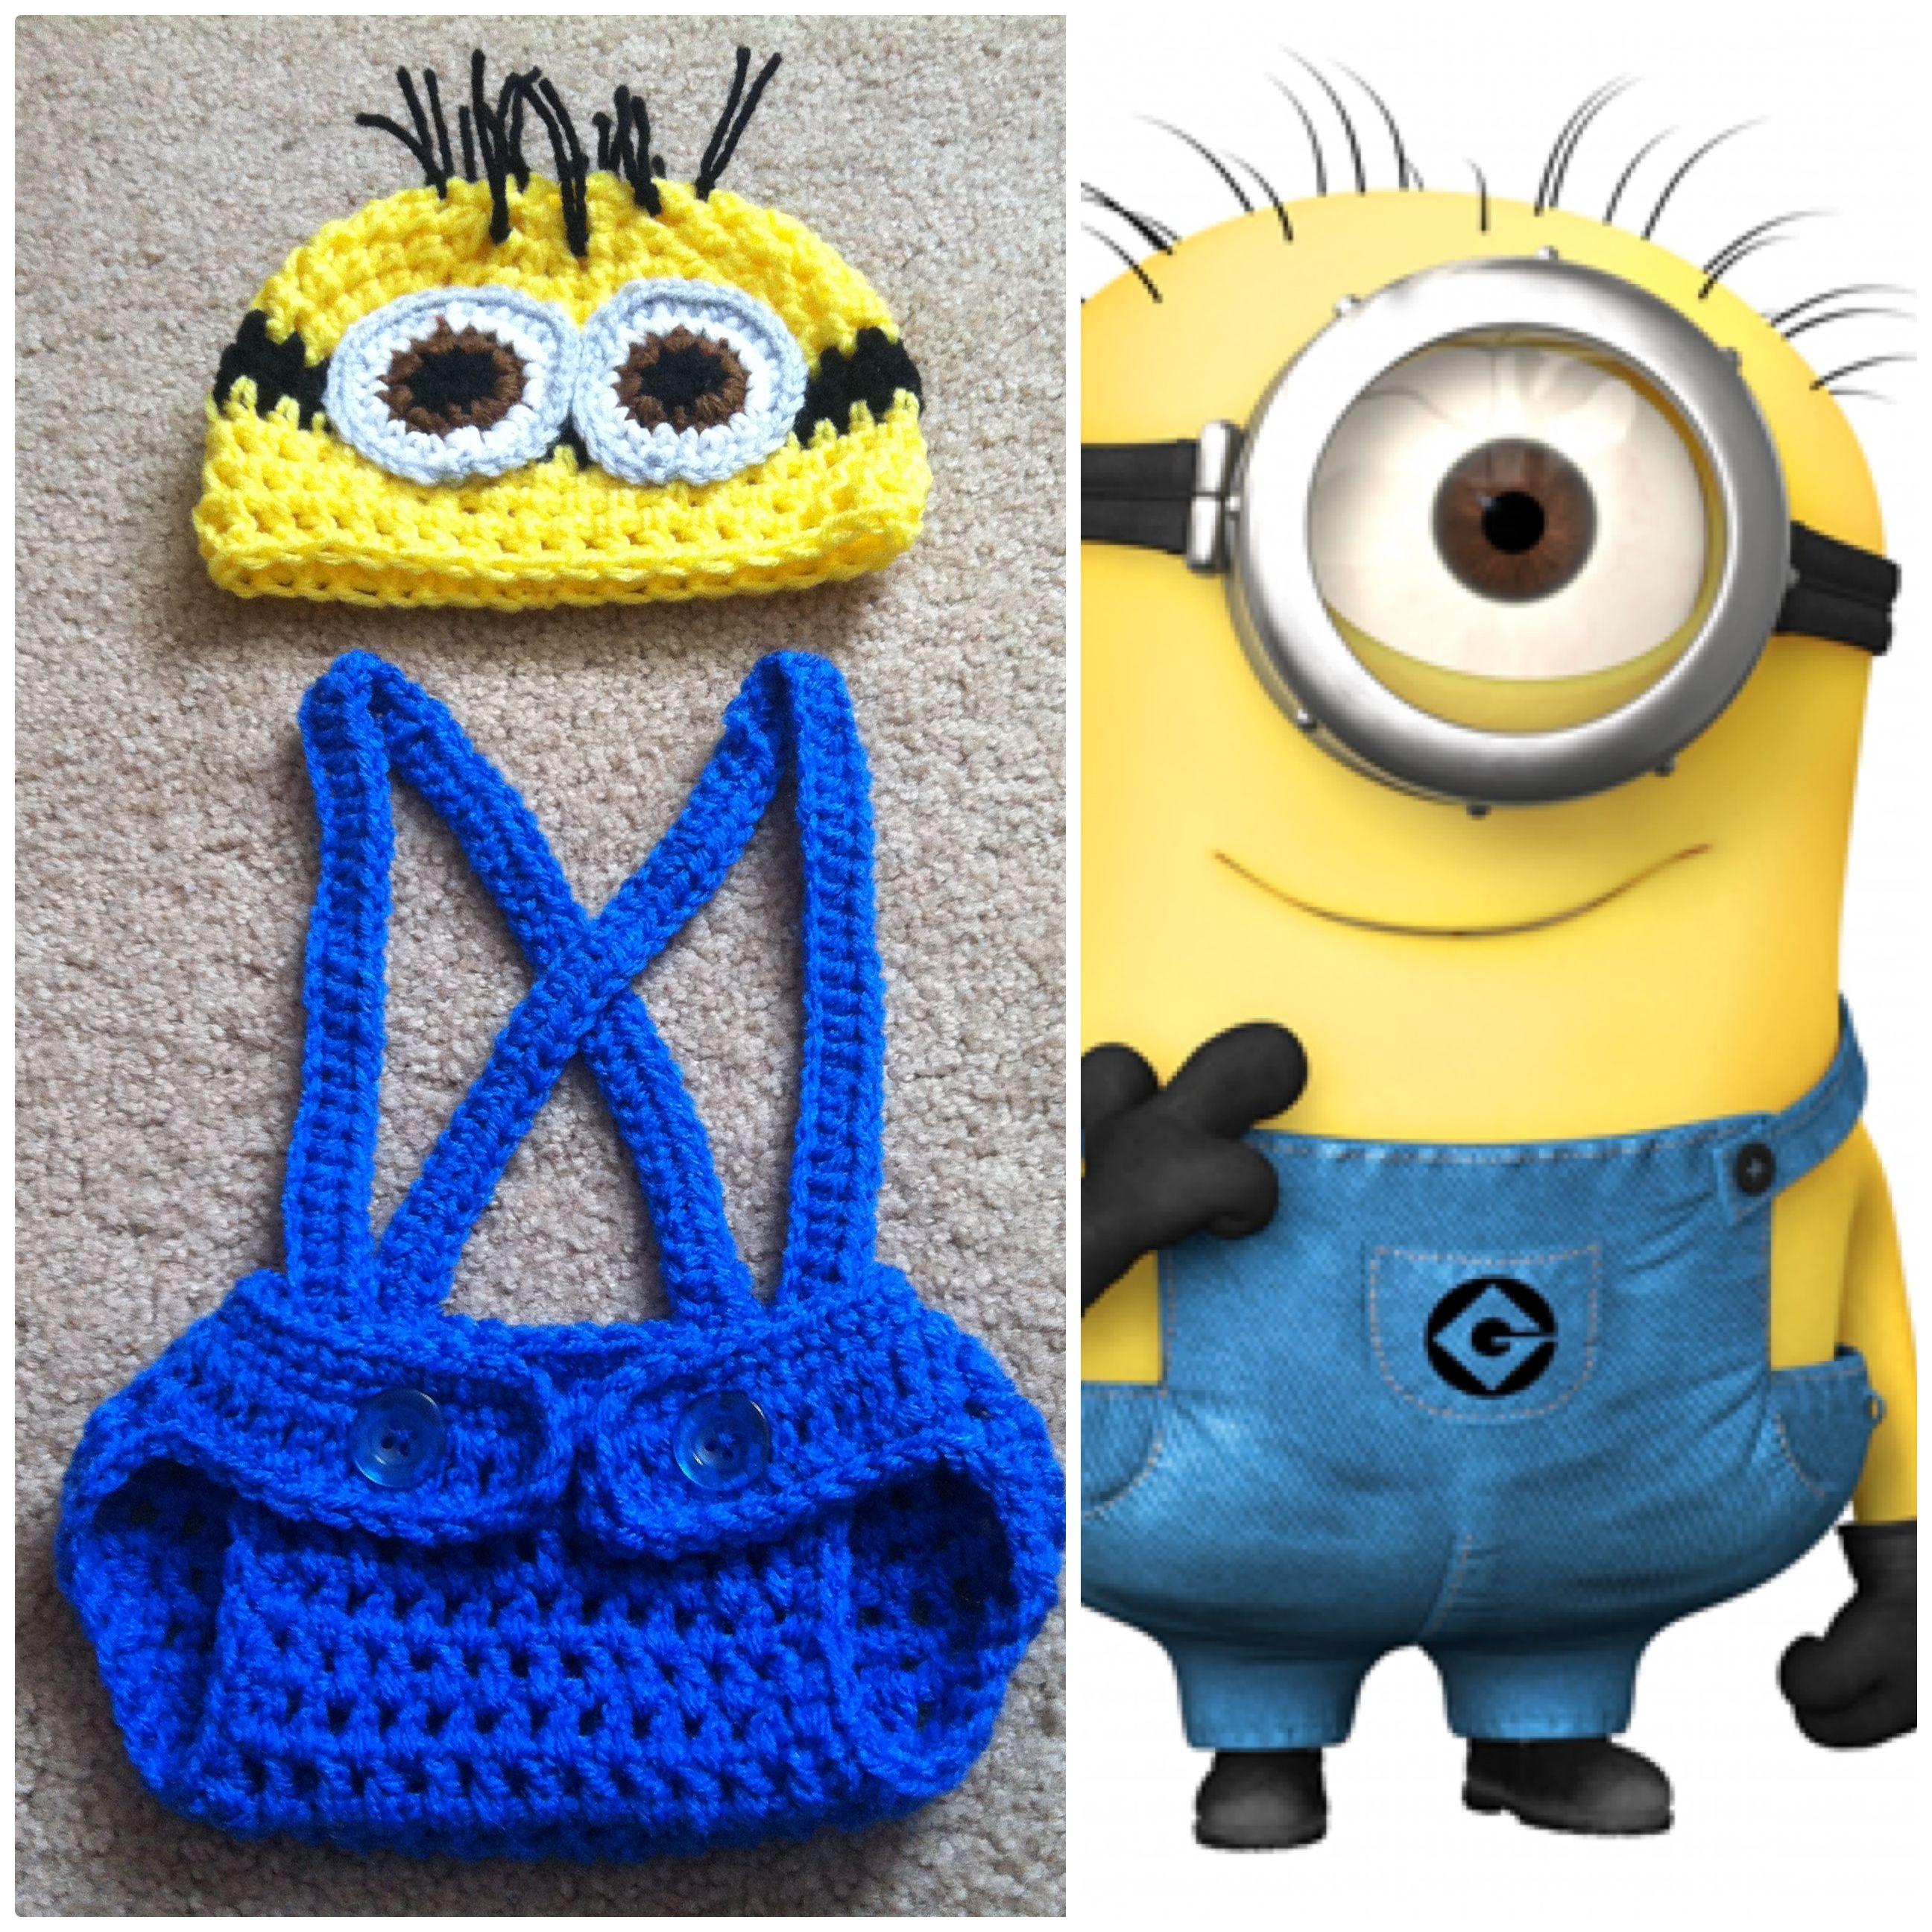 Crochet Minion Outfit | Crochet | Pinterest | Cubre pañales, Tejido ...